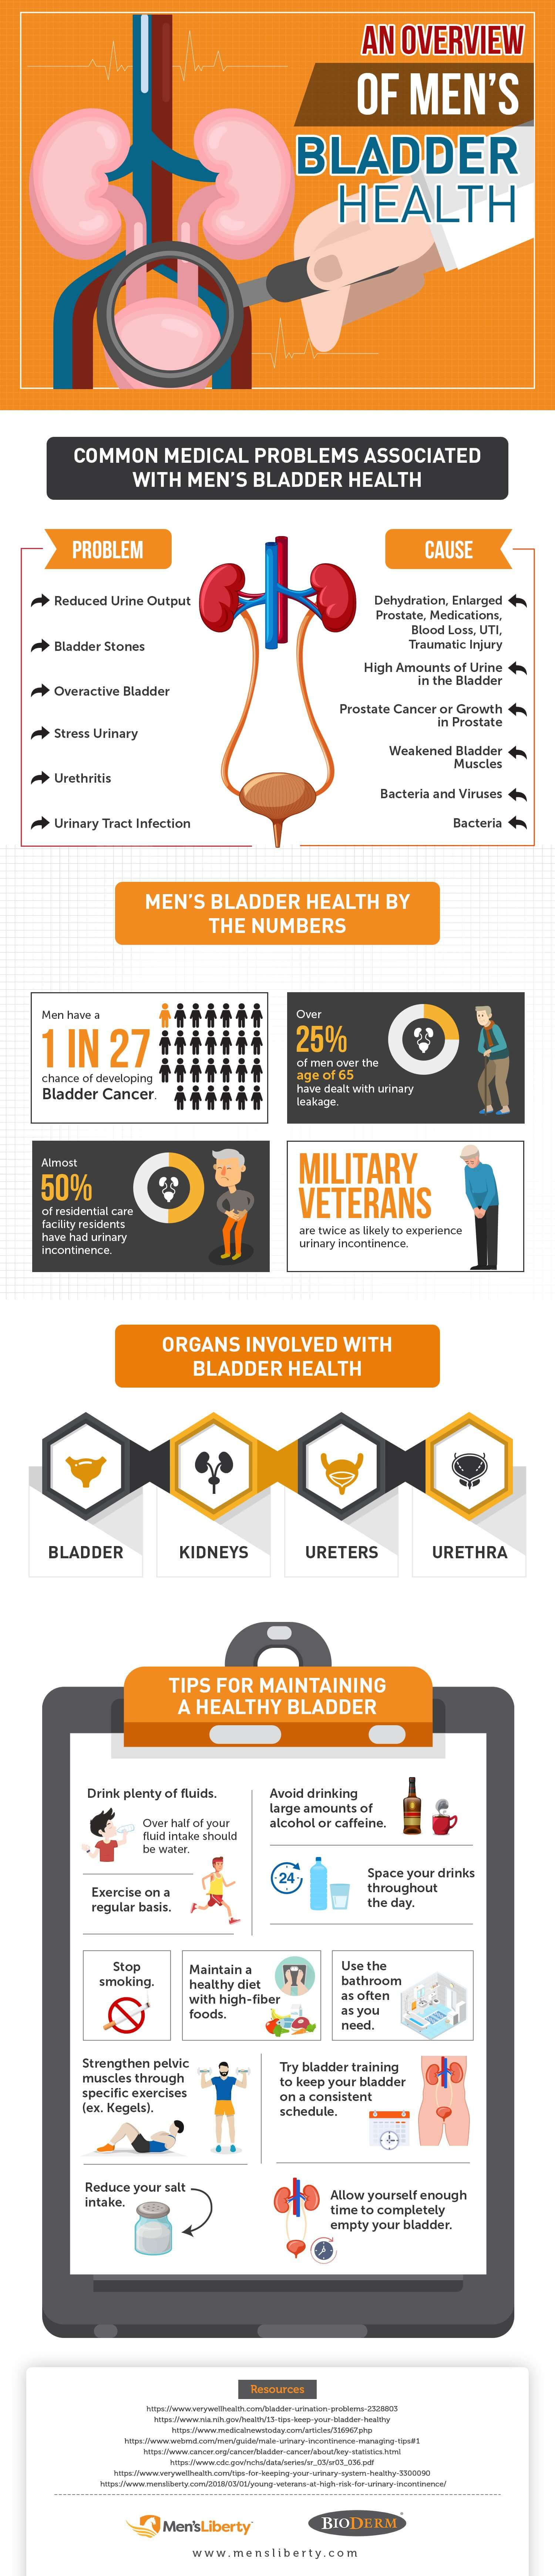 An Overview of Mens Bladder Health